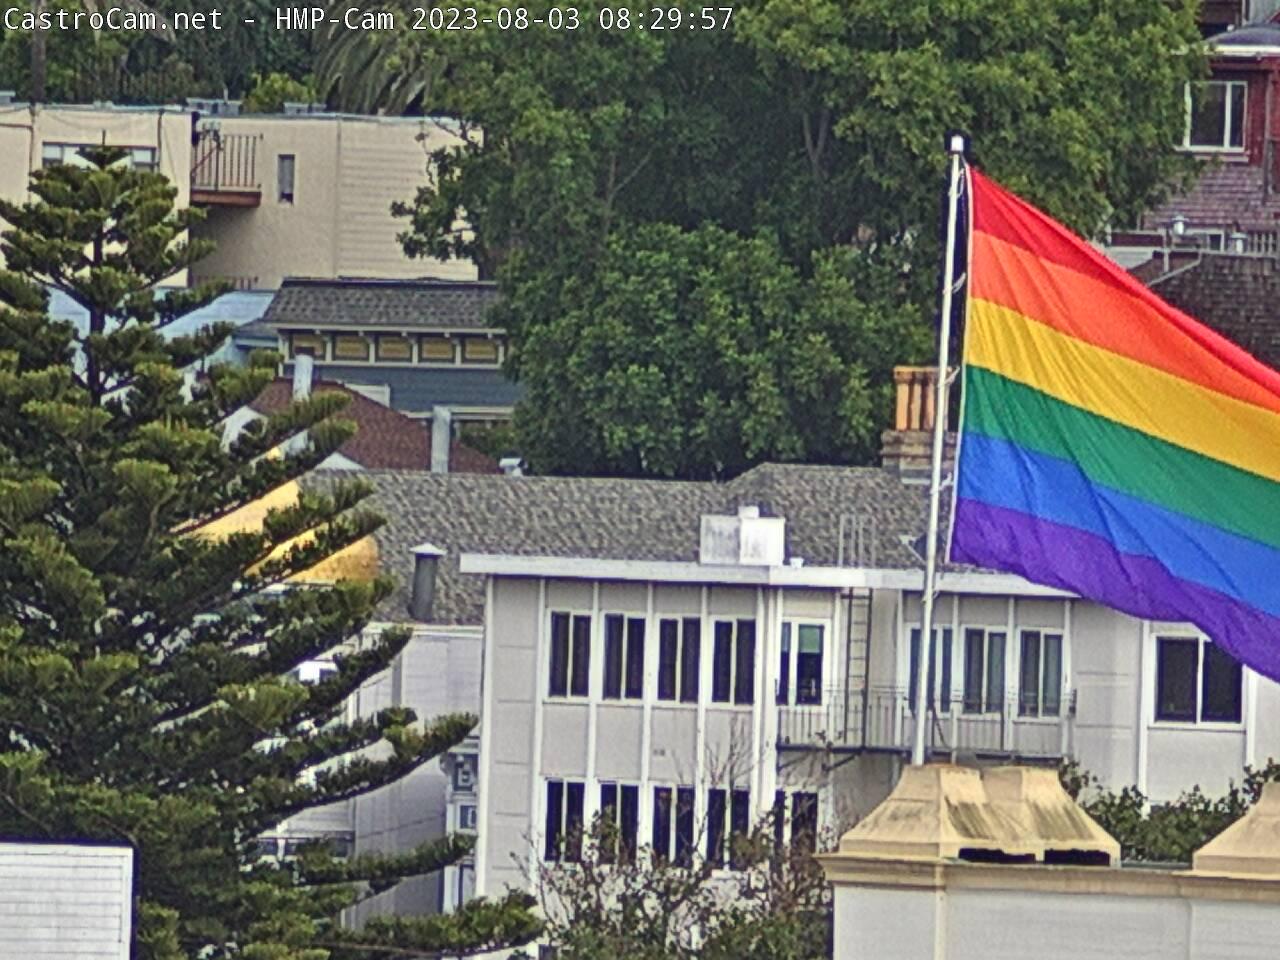 Gay Pride Flag at Harvey Milk Plaza